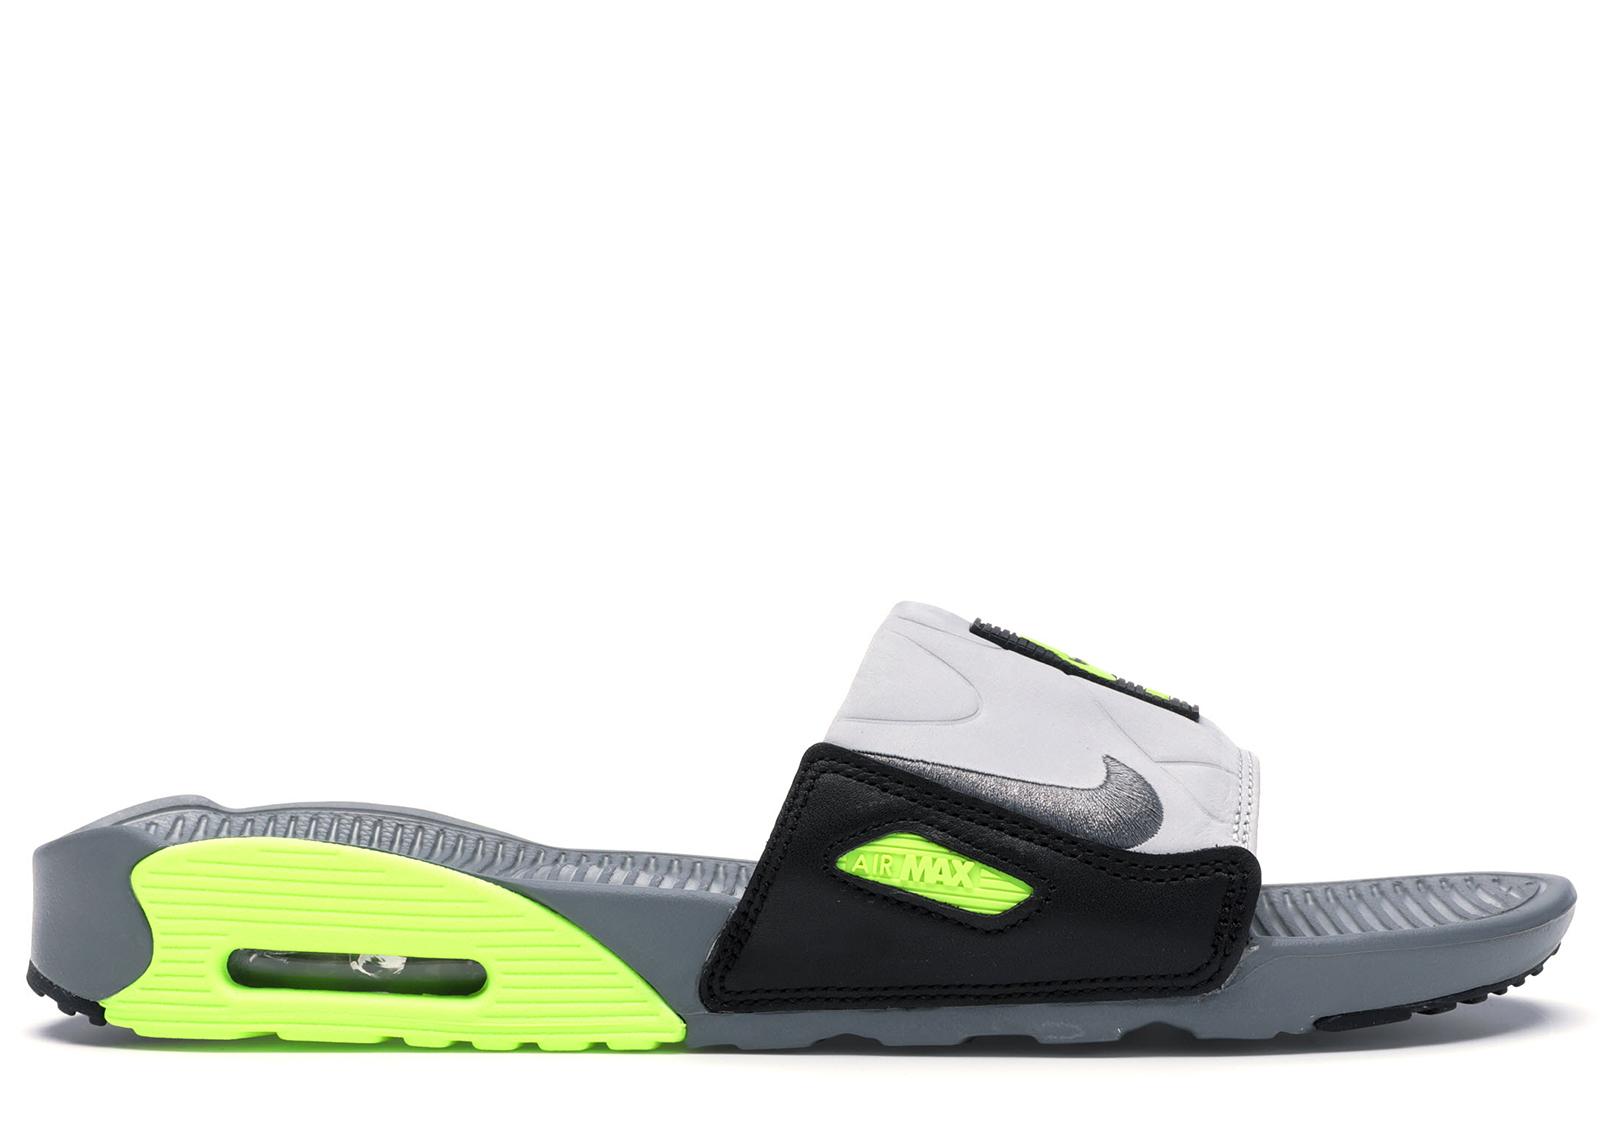 Nike Air Max 90 Slide Smoke Grey Volt Black